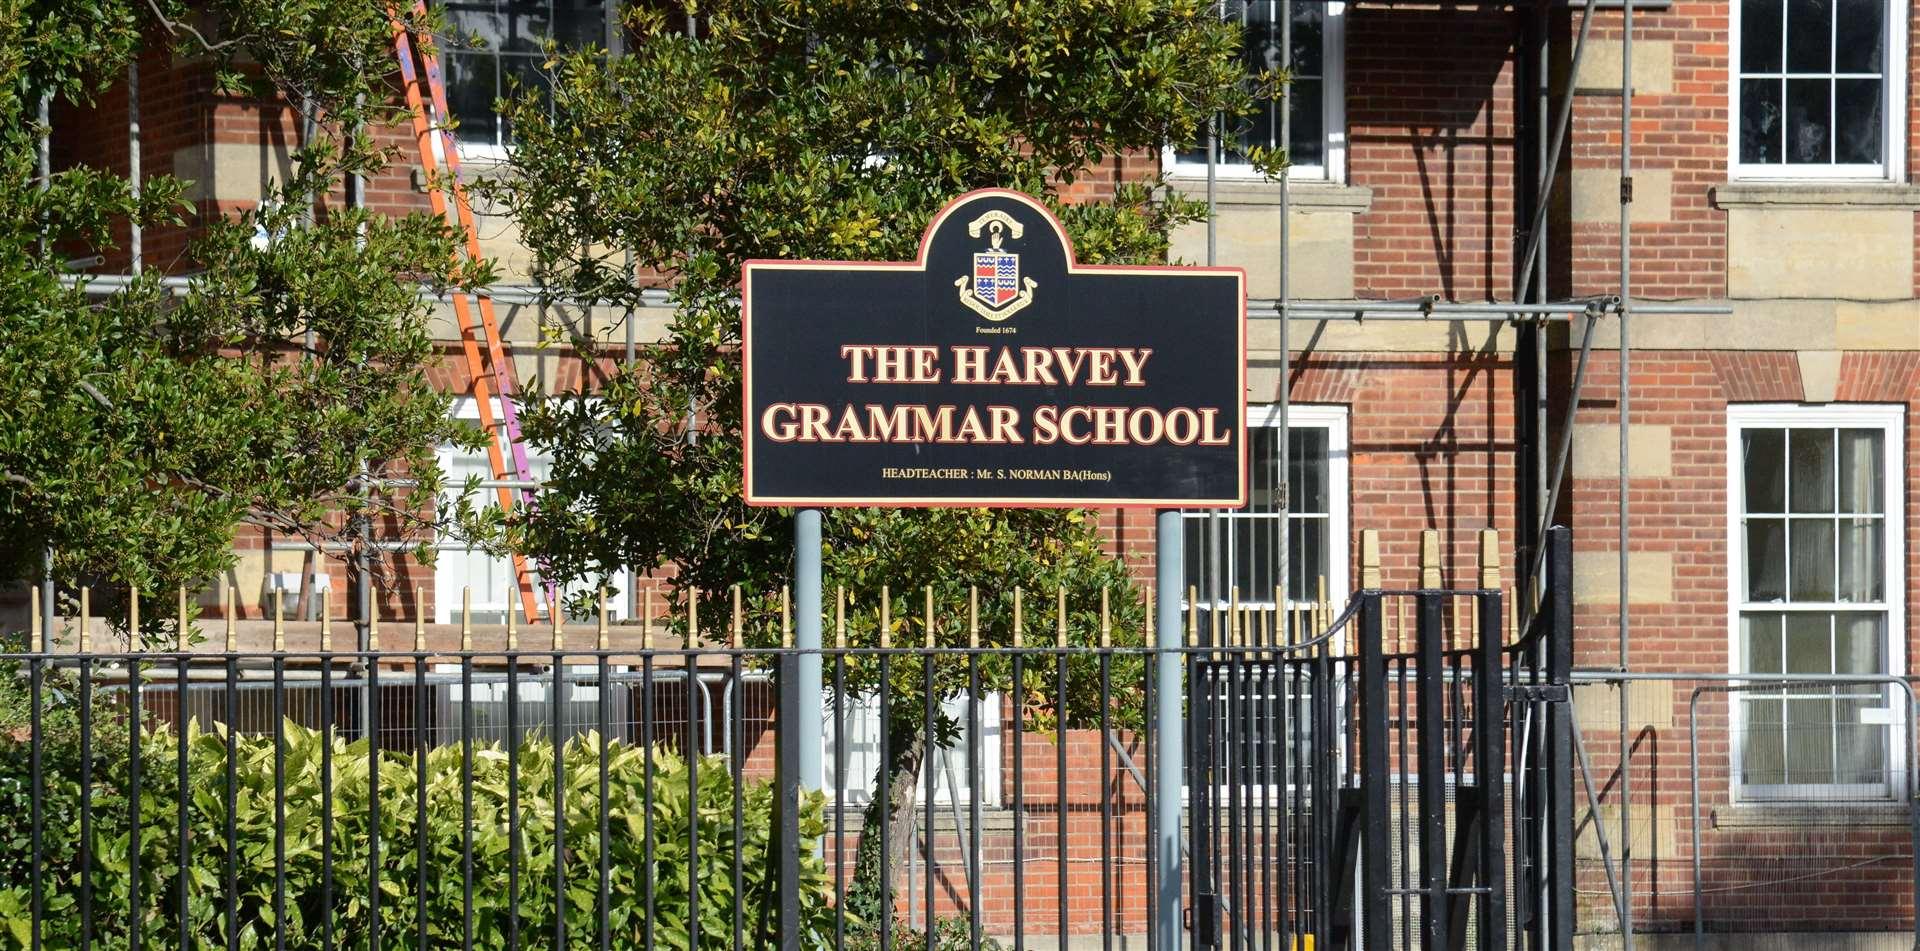 The Harvey Grammar School in Folkestone. Picture: Gary Browne